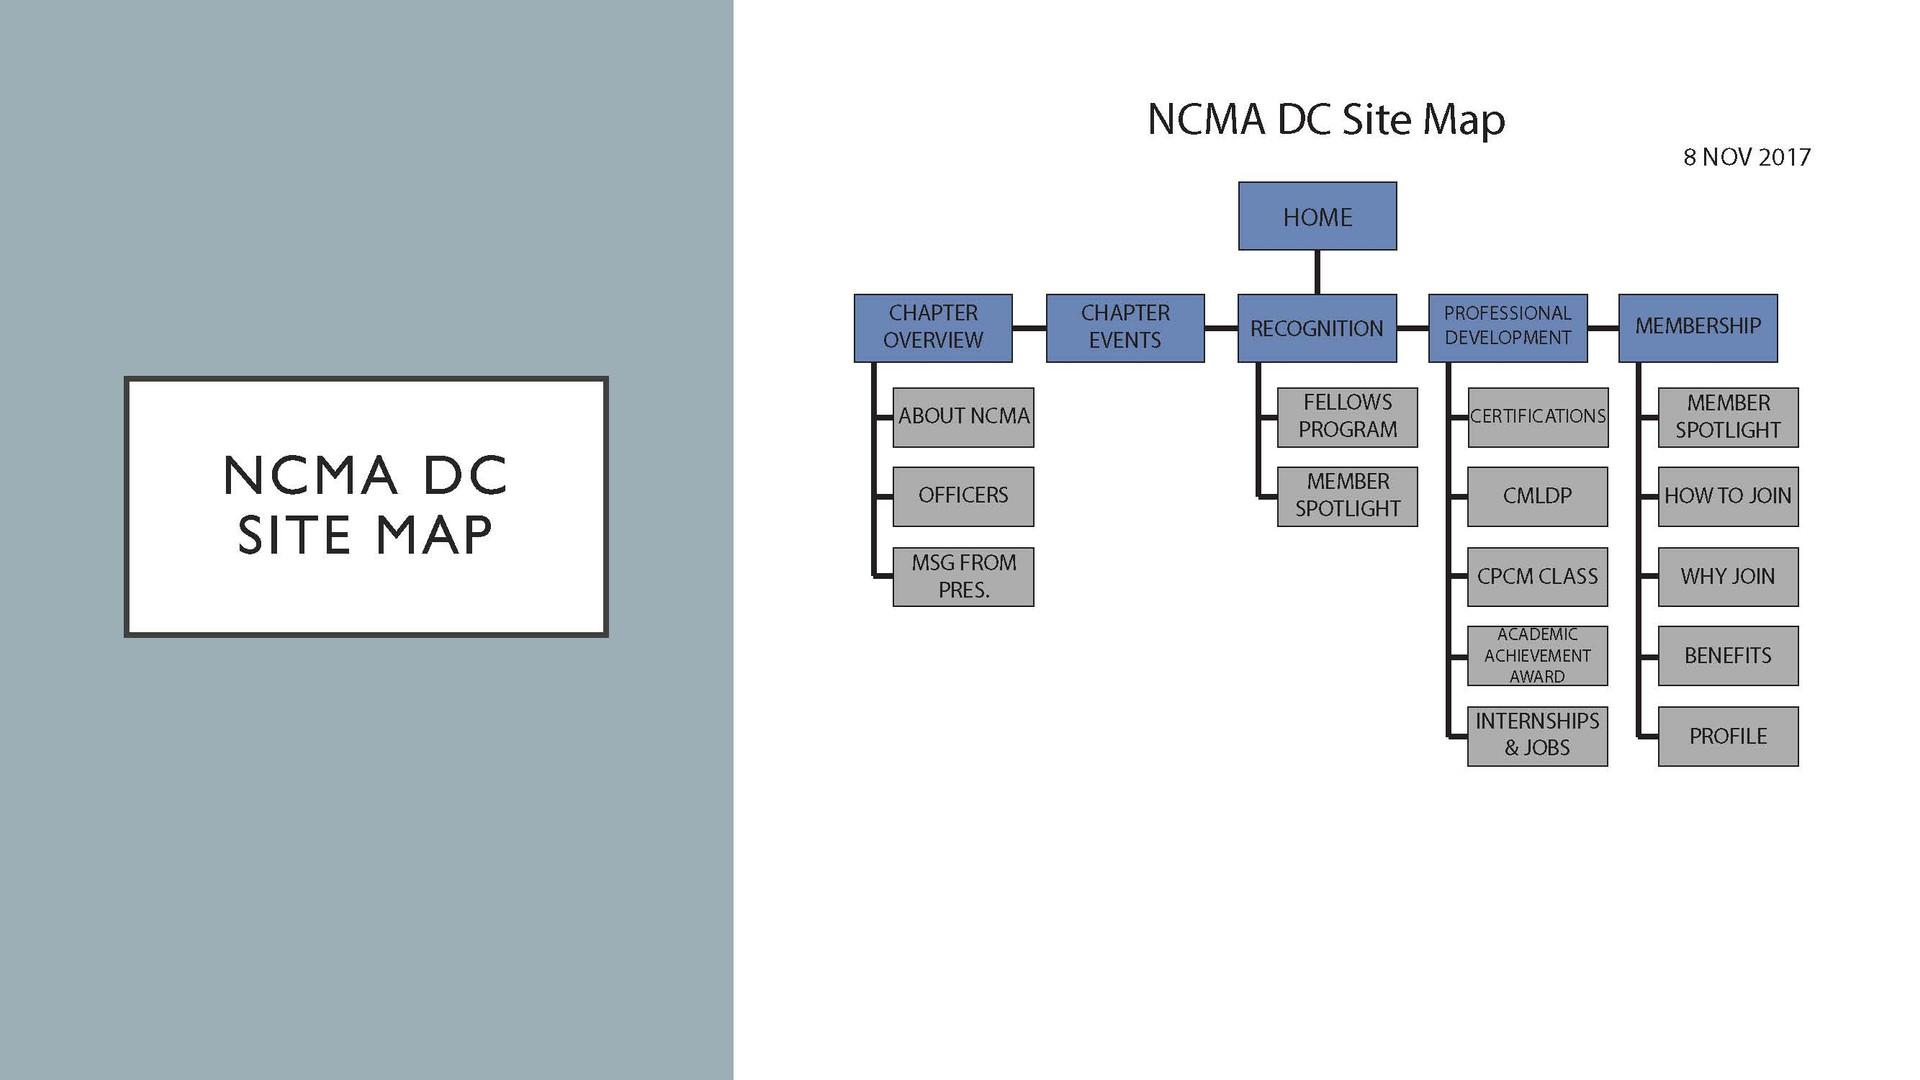 NCMA SiteMap